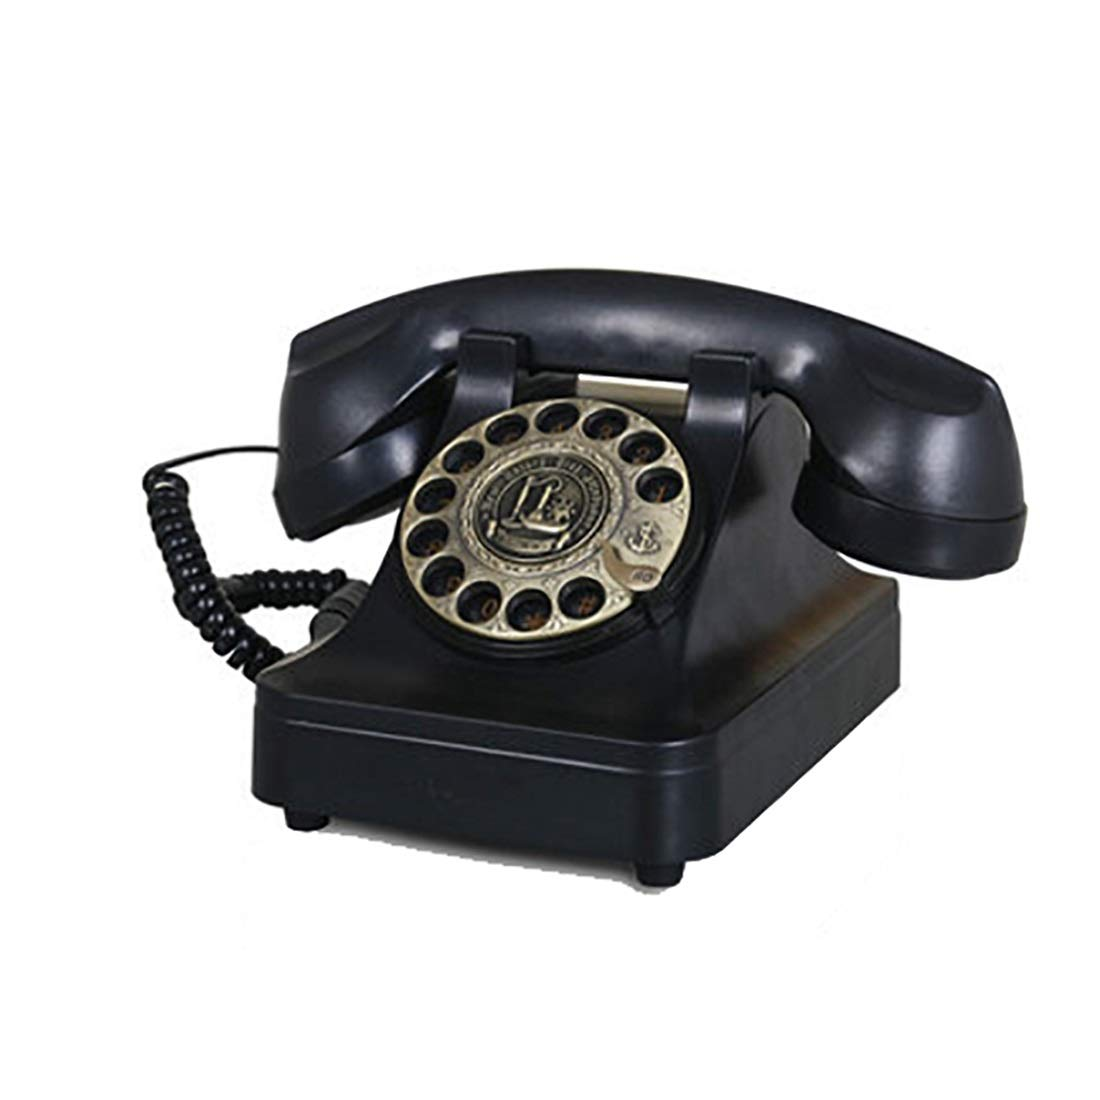 ZHILIAN Black Classic Square European Retro Telephone Landline Fixed Telephone Rotary Dial Home Living Room Decoration Phone